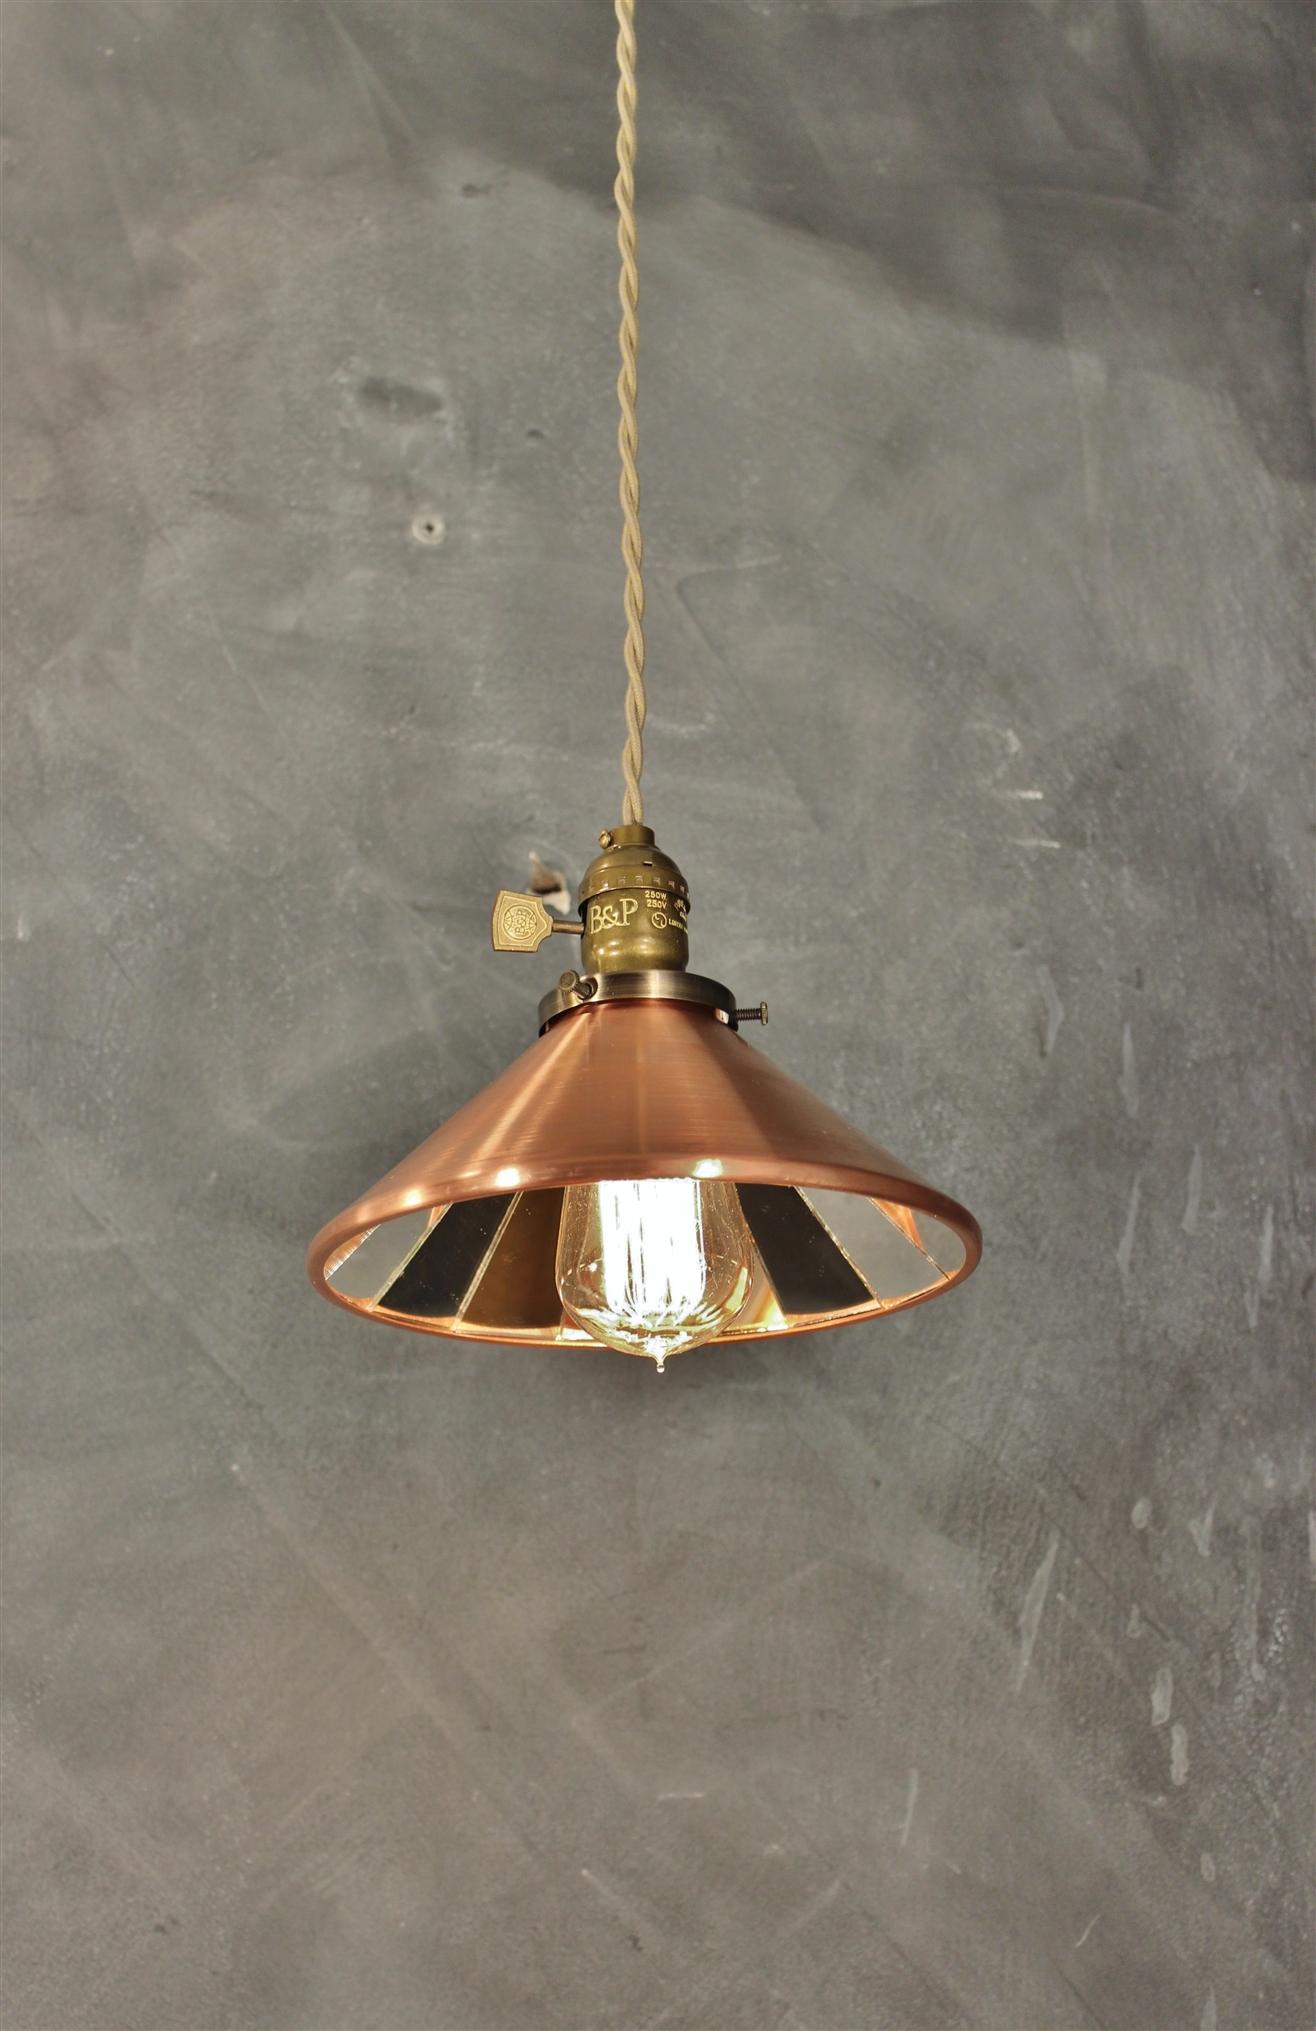 Industrial Pendant Lamp w/ Cone Mirror Reflector Shade ...